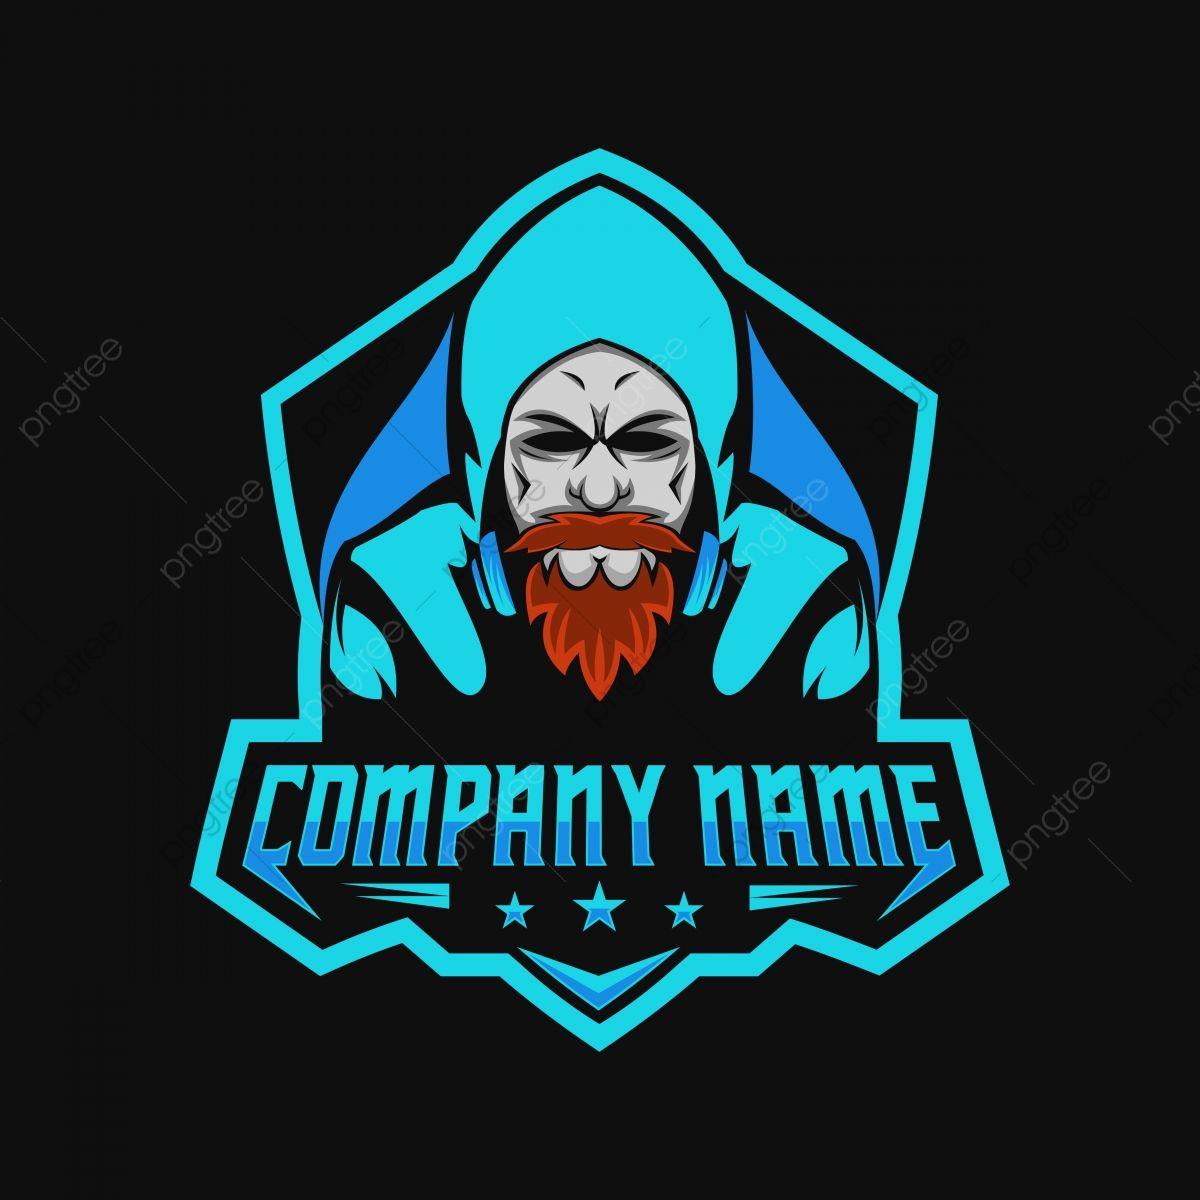 Beard Man Gamers Gaming E Sport Logo Amazing Design For Your